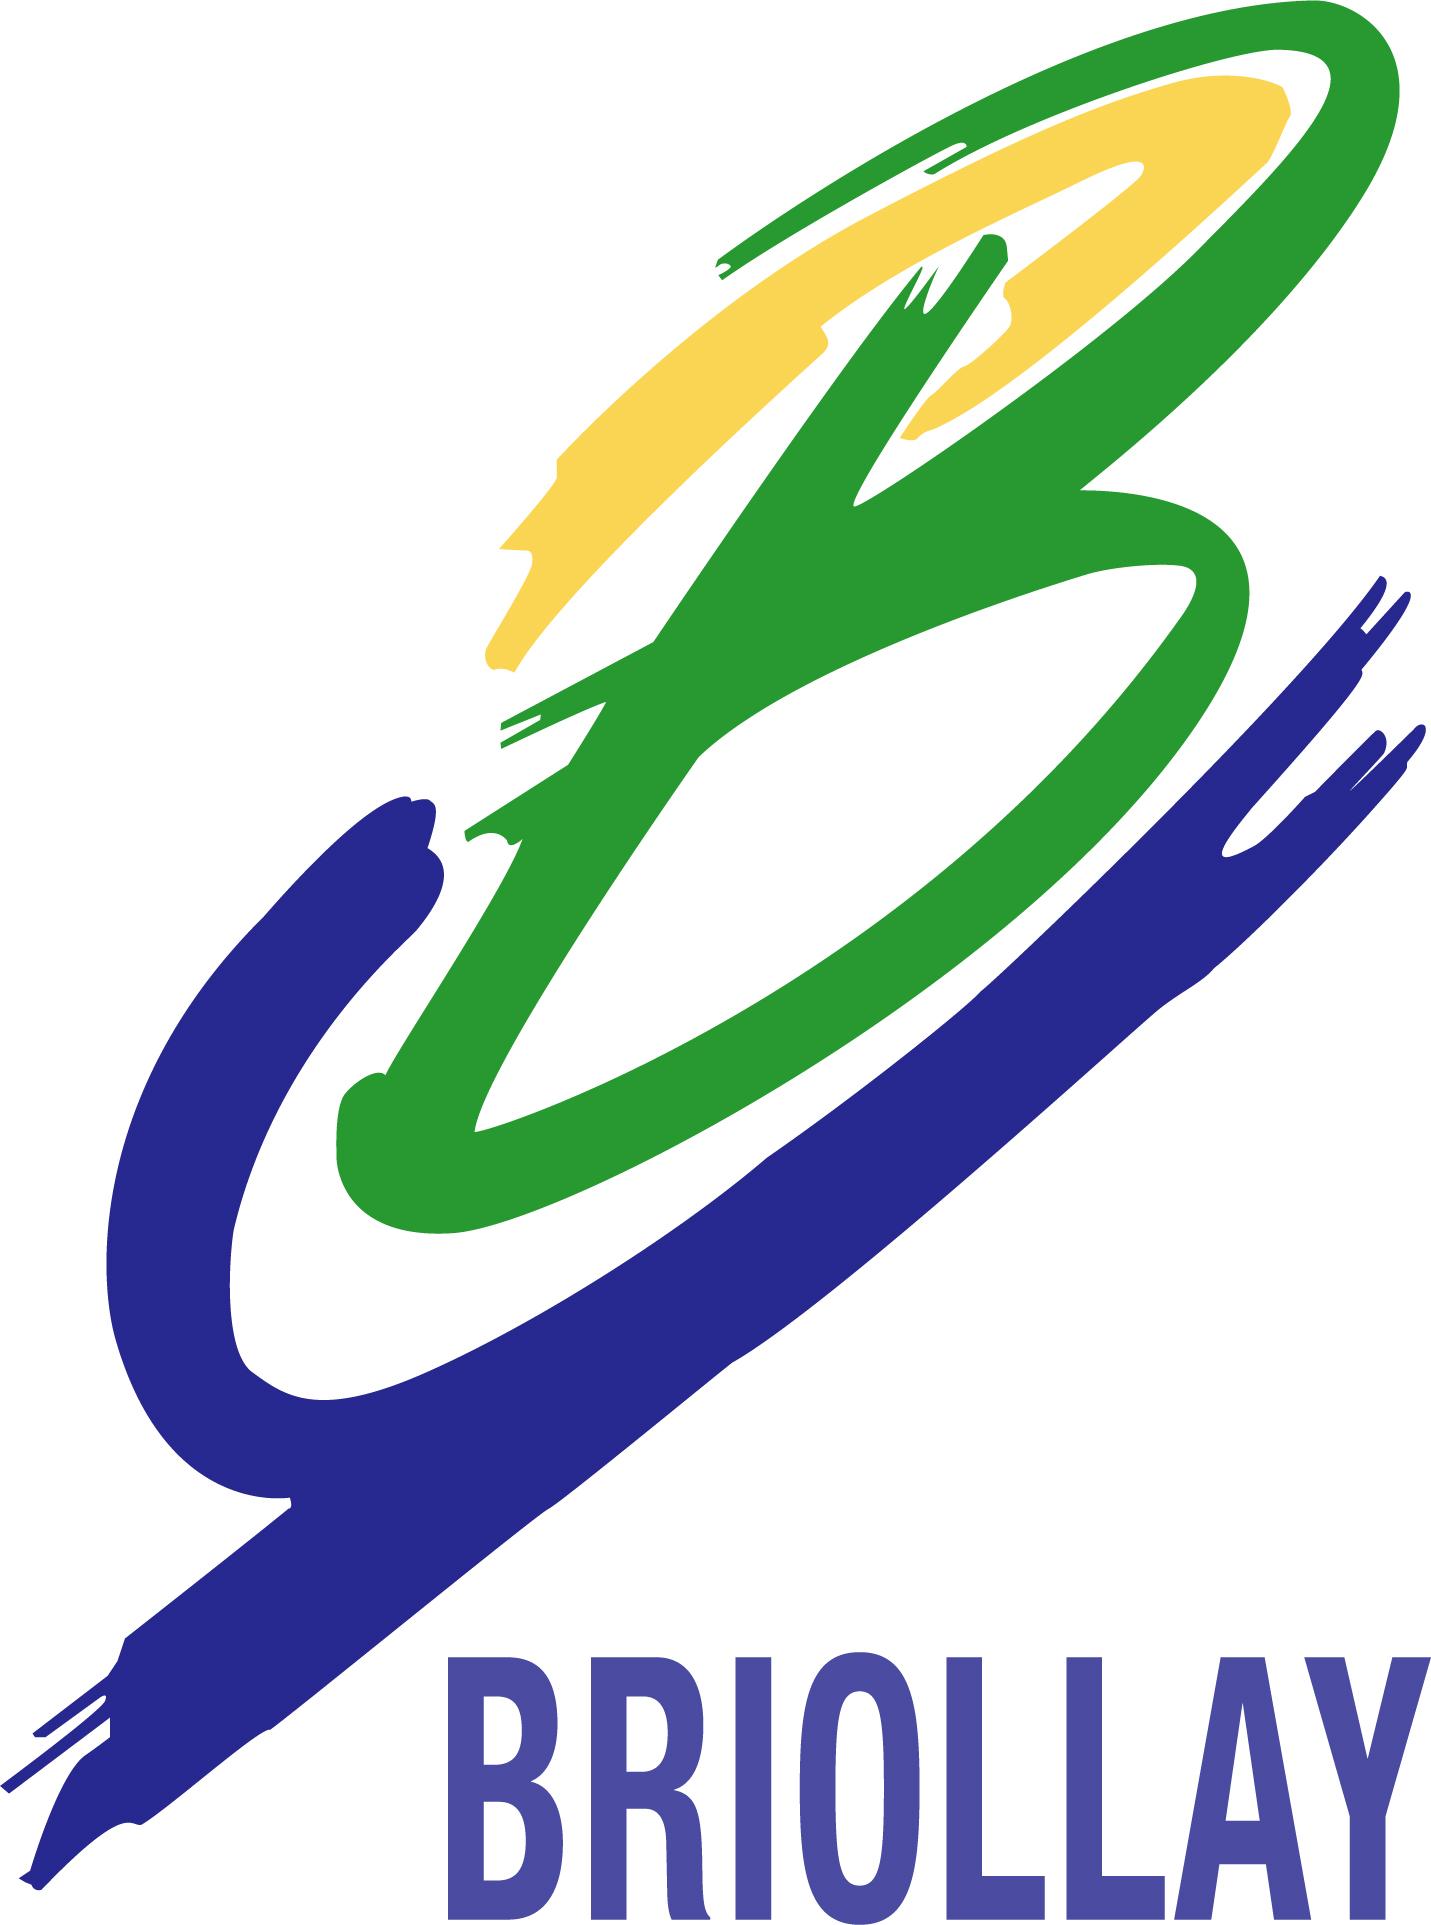 logo briollay